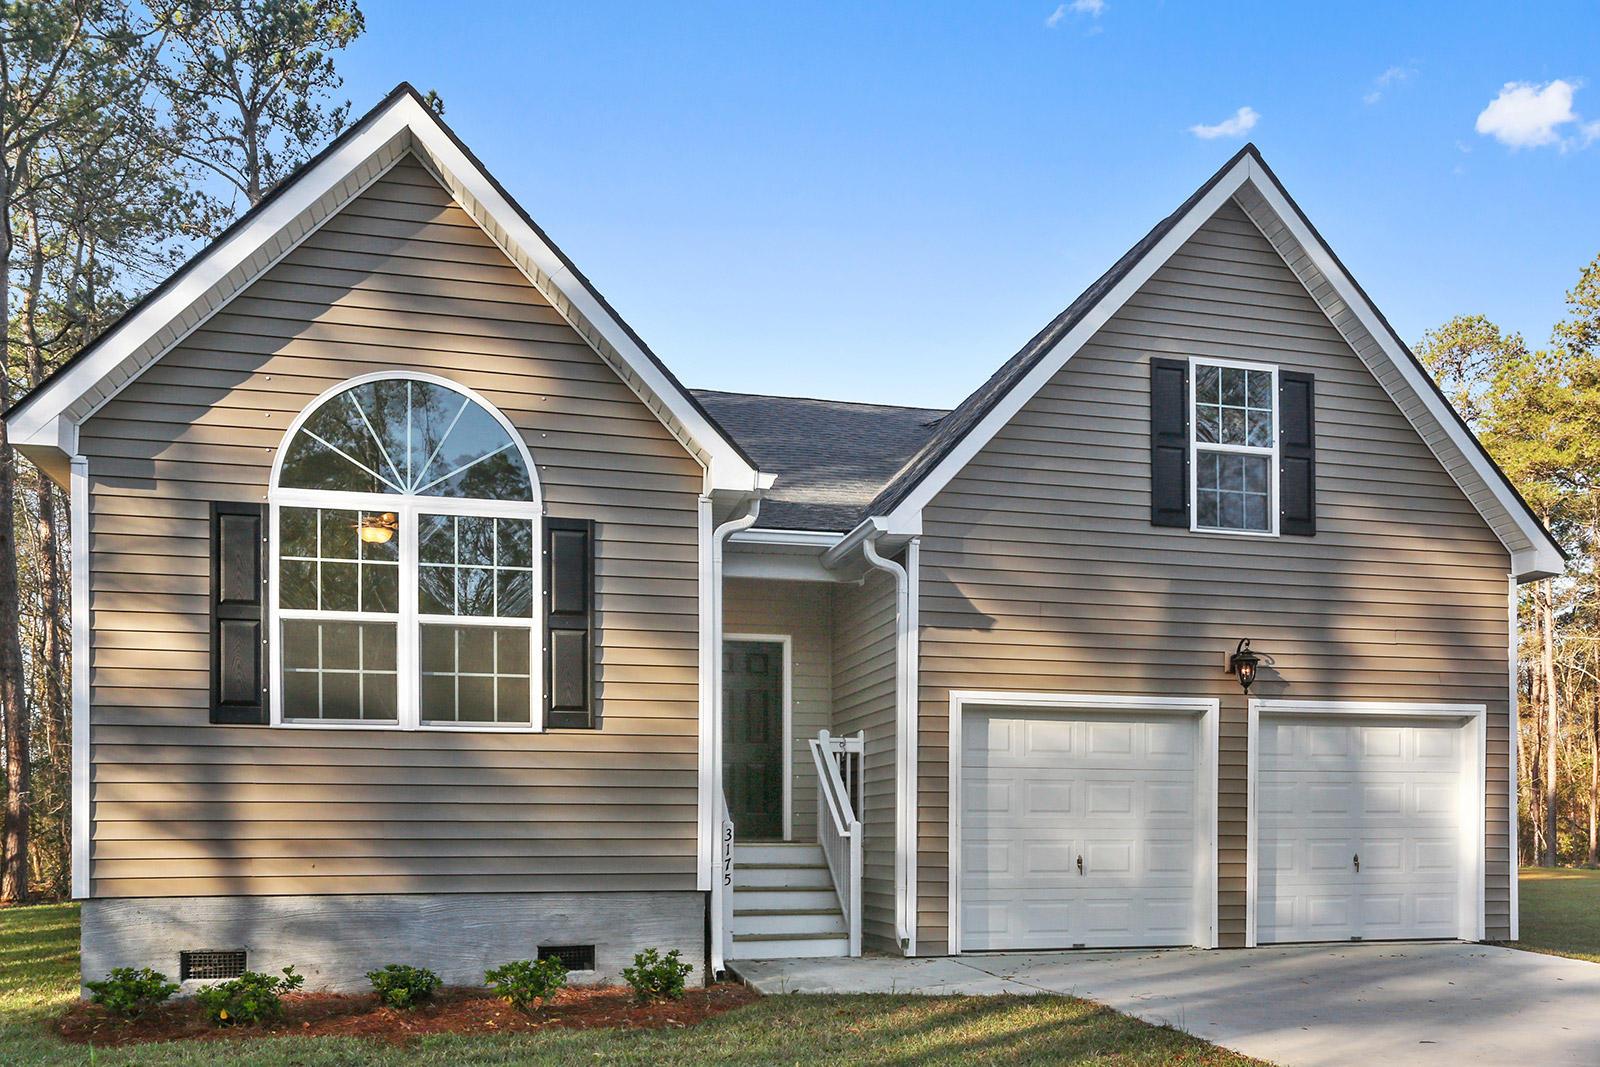 Britton Homes For Sale - 3175 Edenvale, Johns Island, SC - 1